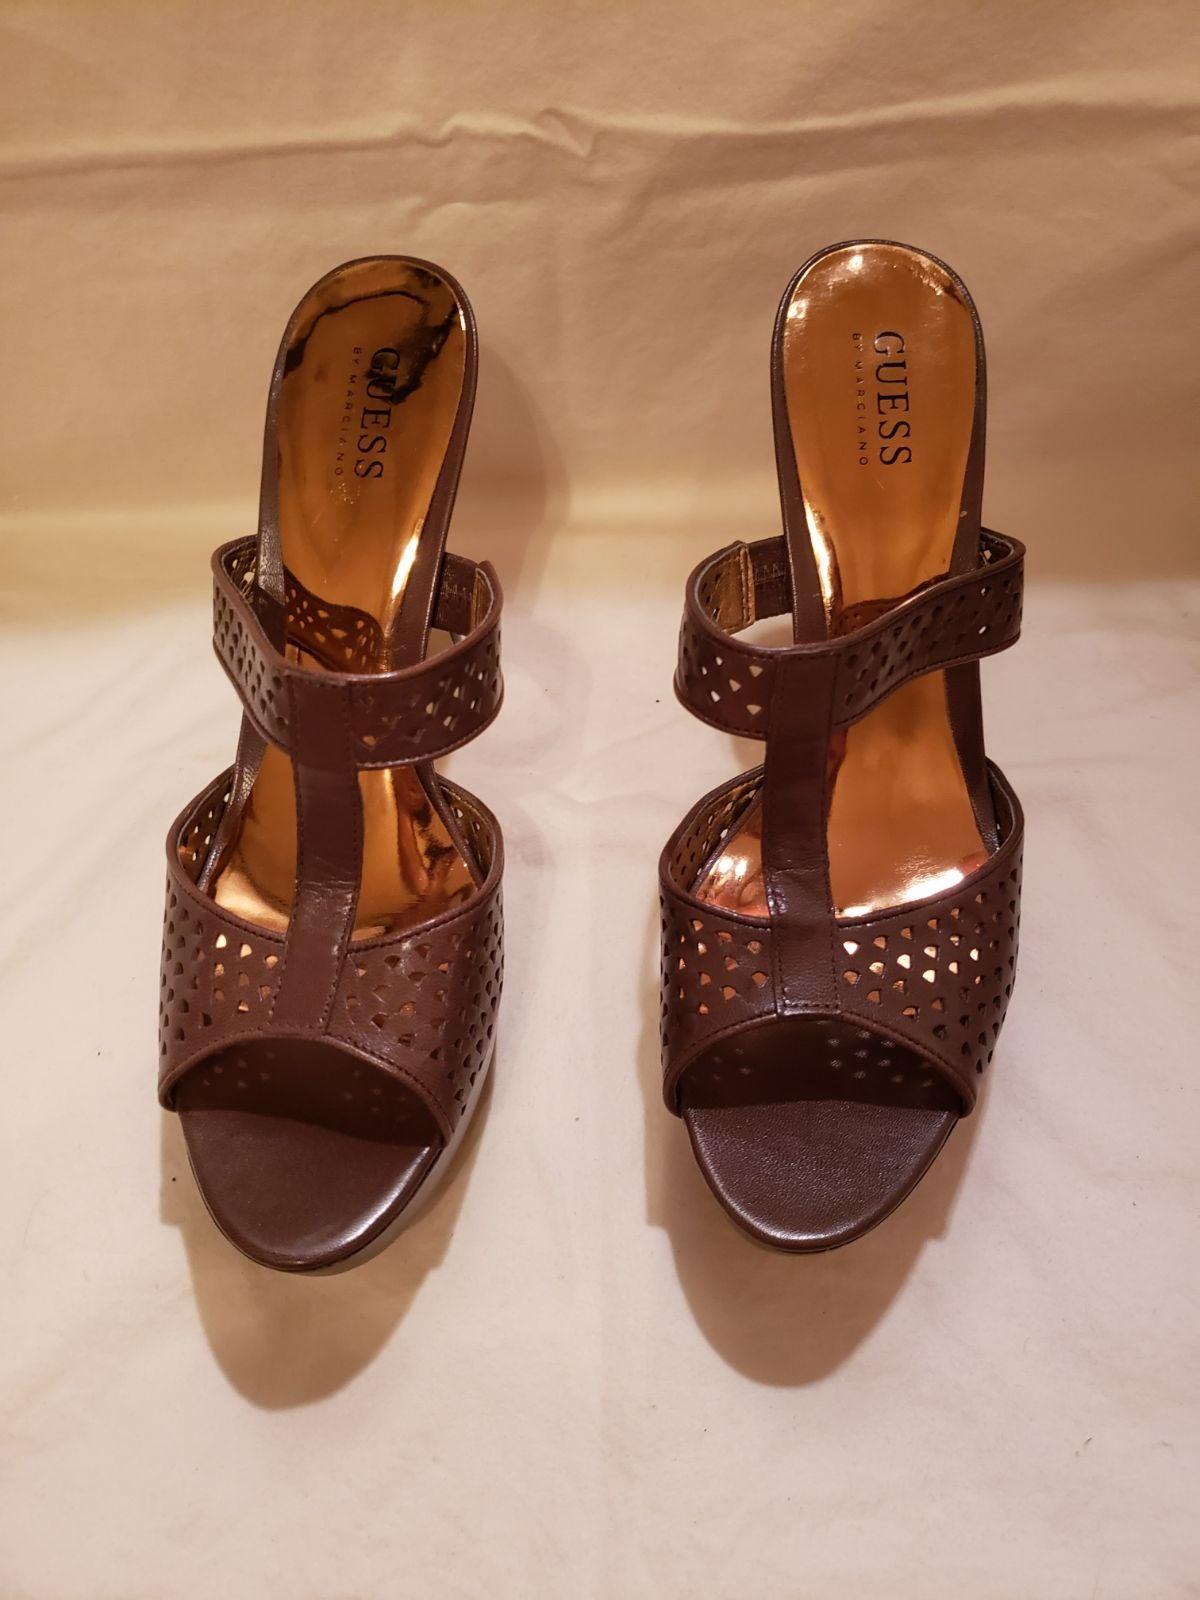 Guess women's platform leather Heels